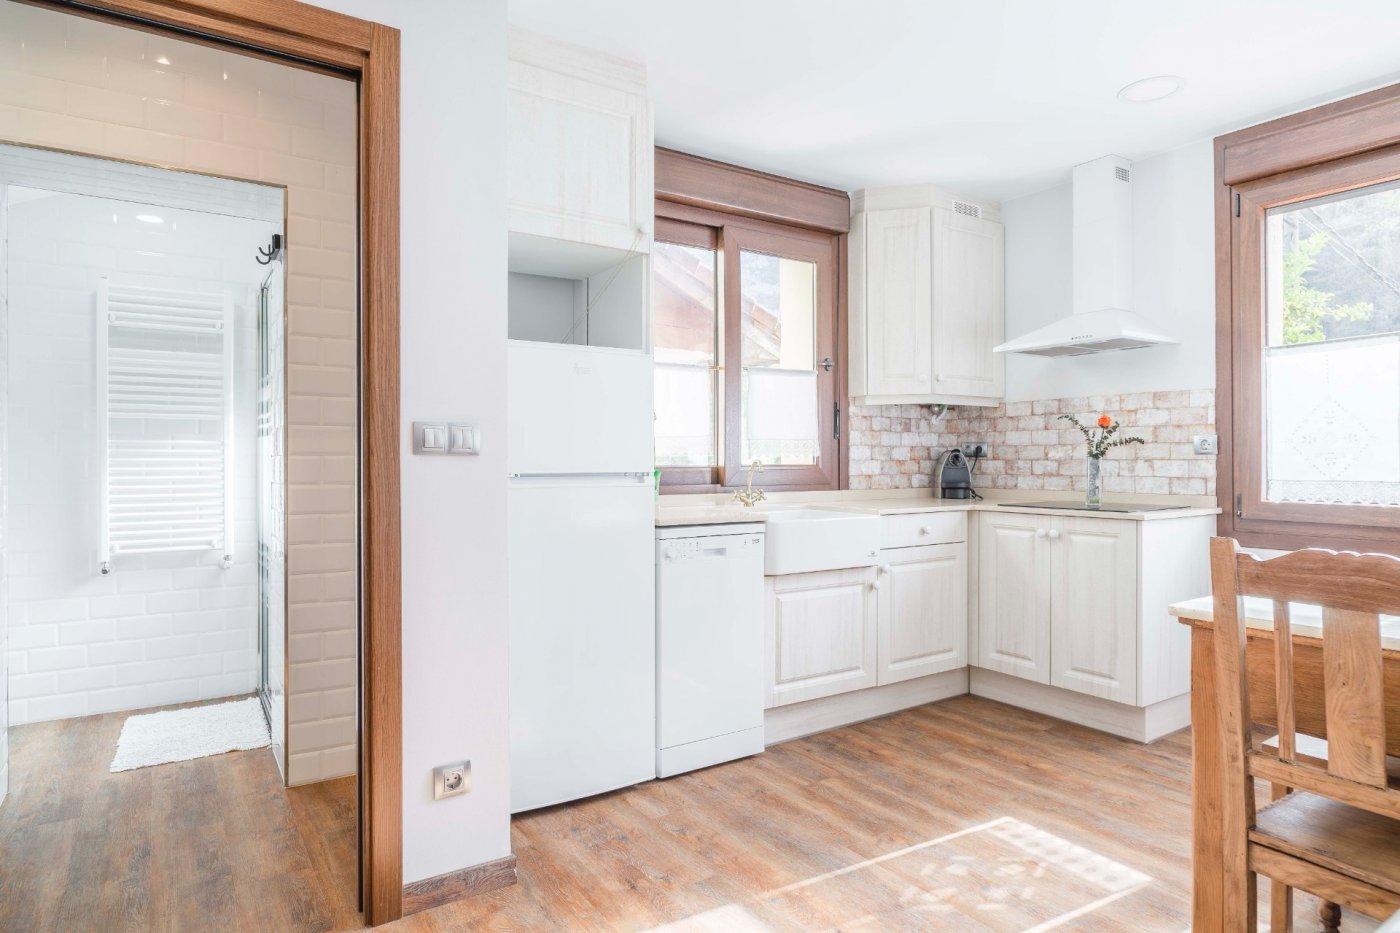 casa-con-terreno en proaza · proaza 386500€